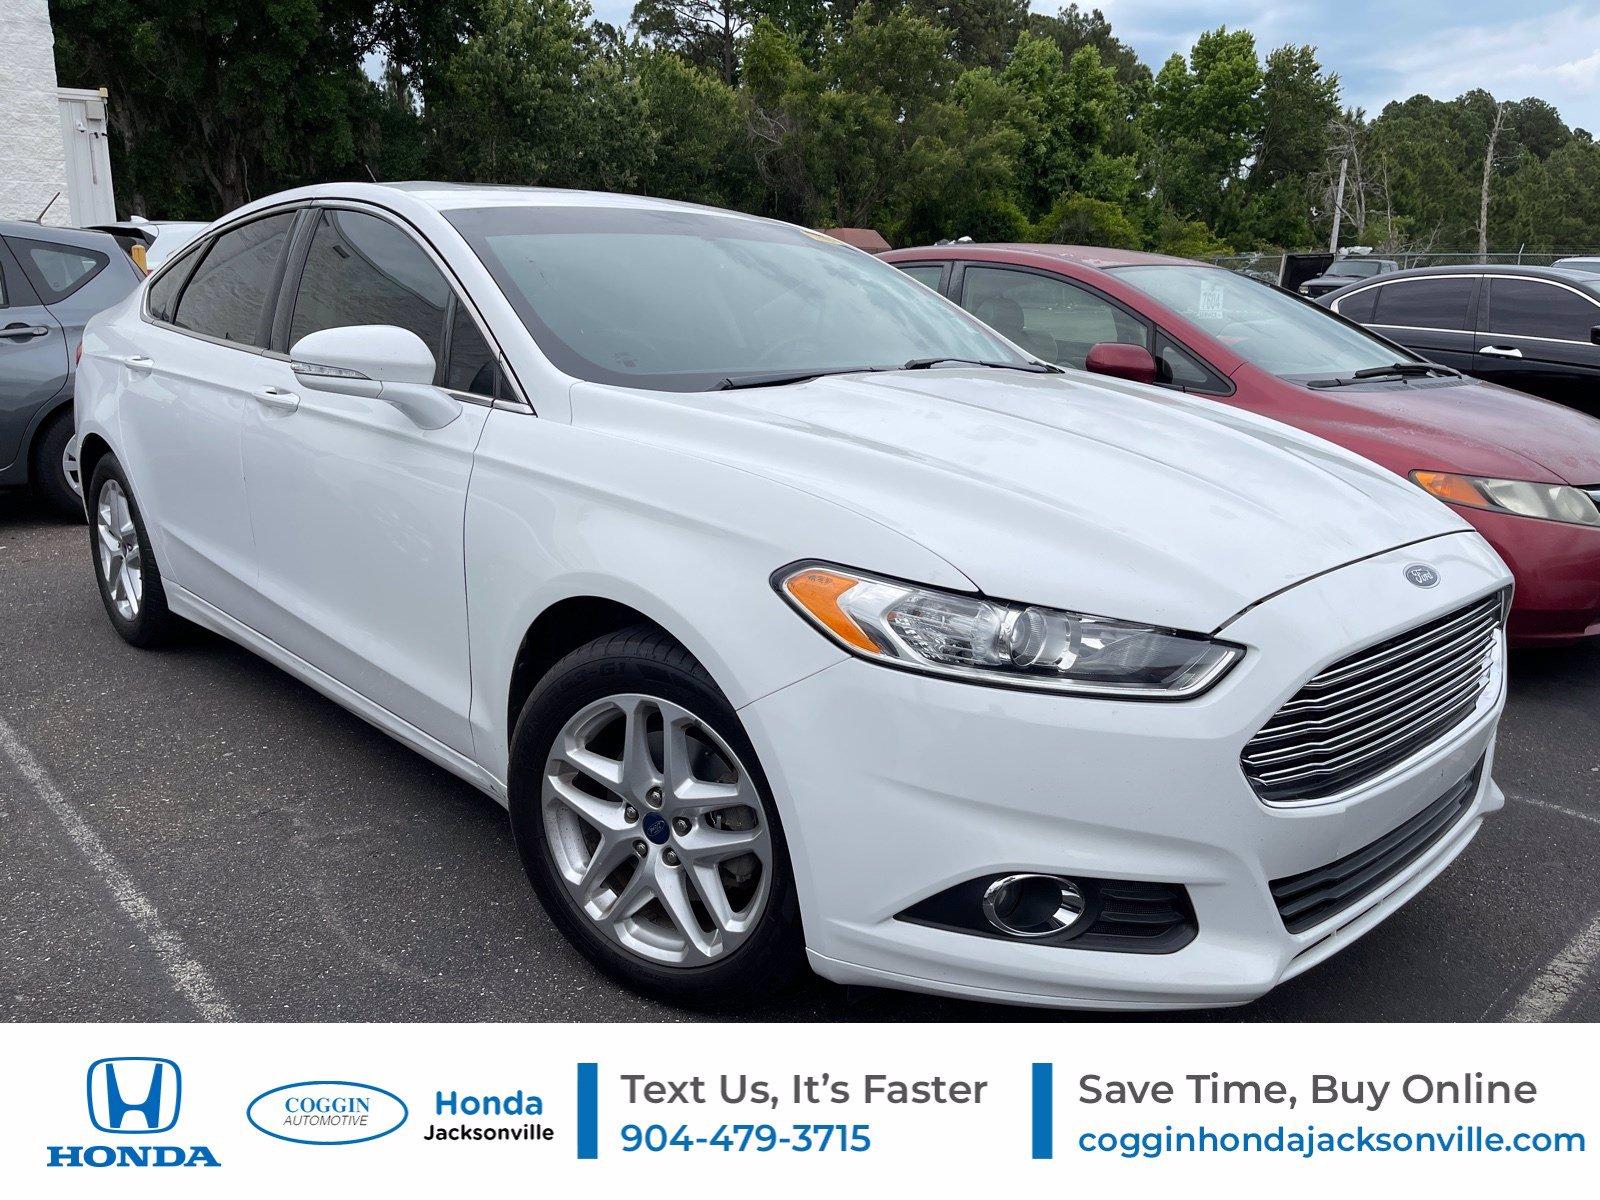 2013 Ford Fusion Sedan